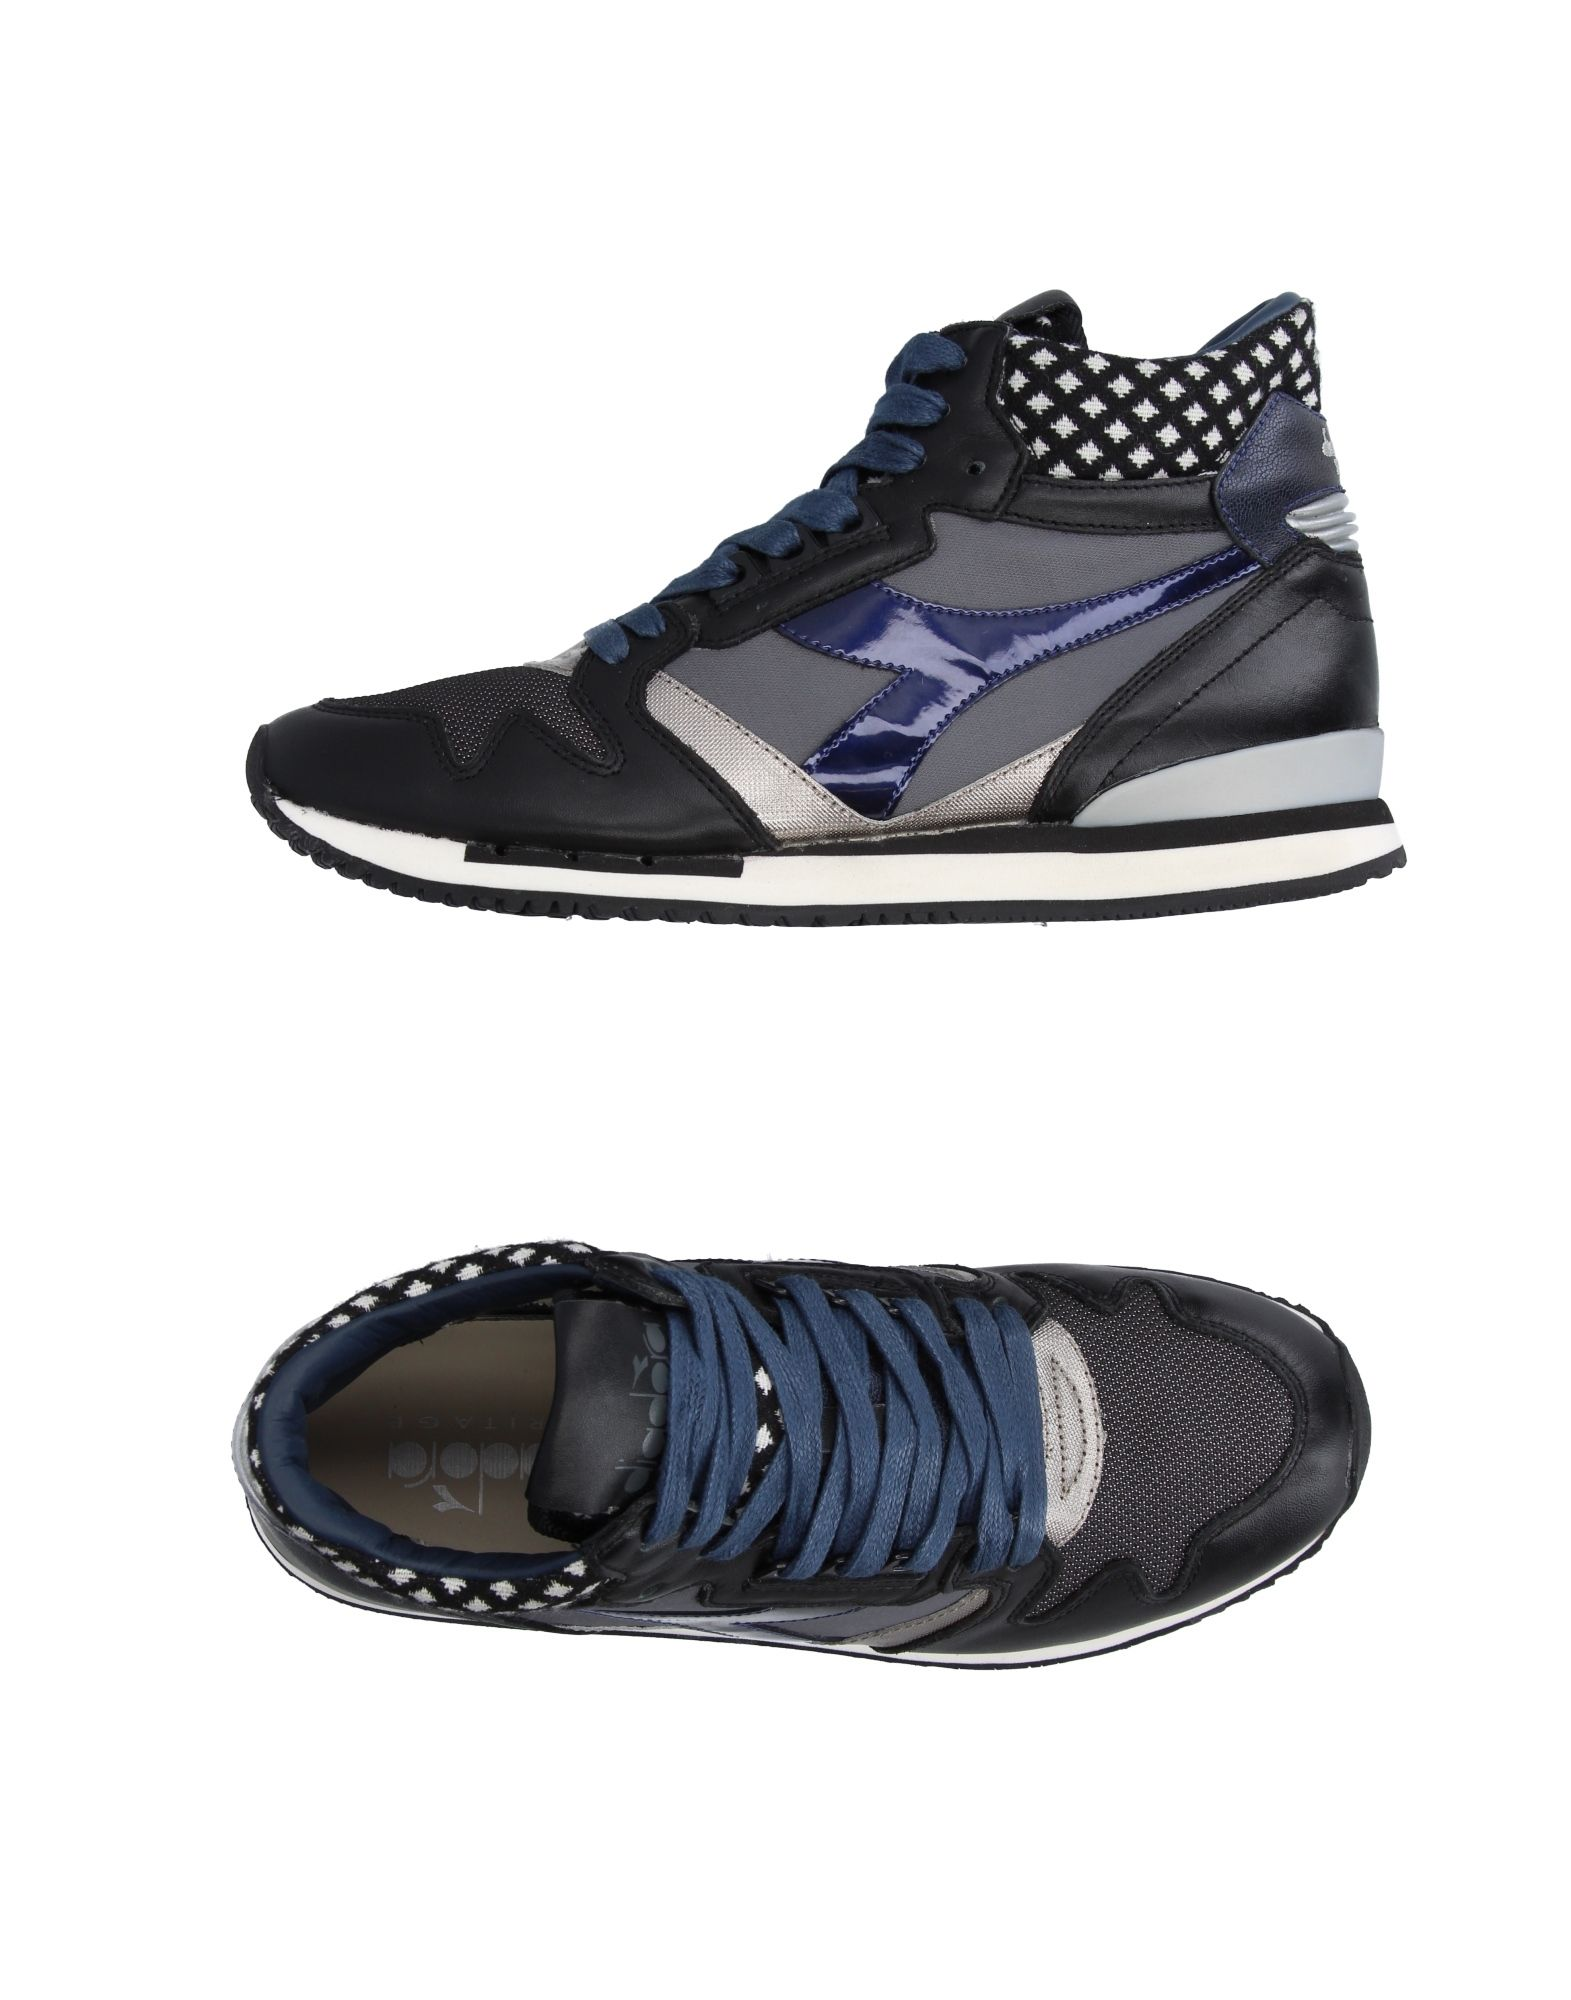 Diadora Heritage Sneakers - Men on Diadora Heritage Sneakers online on Men  Canada - 11231458KF 1cf8e8